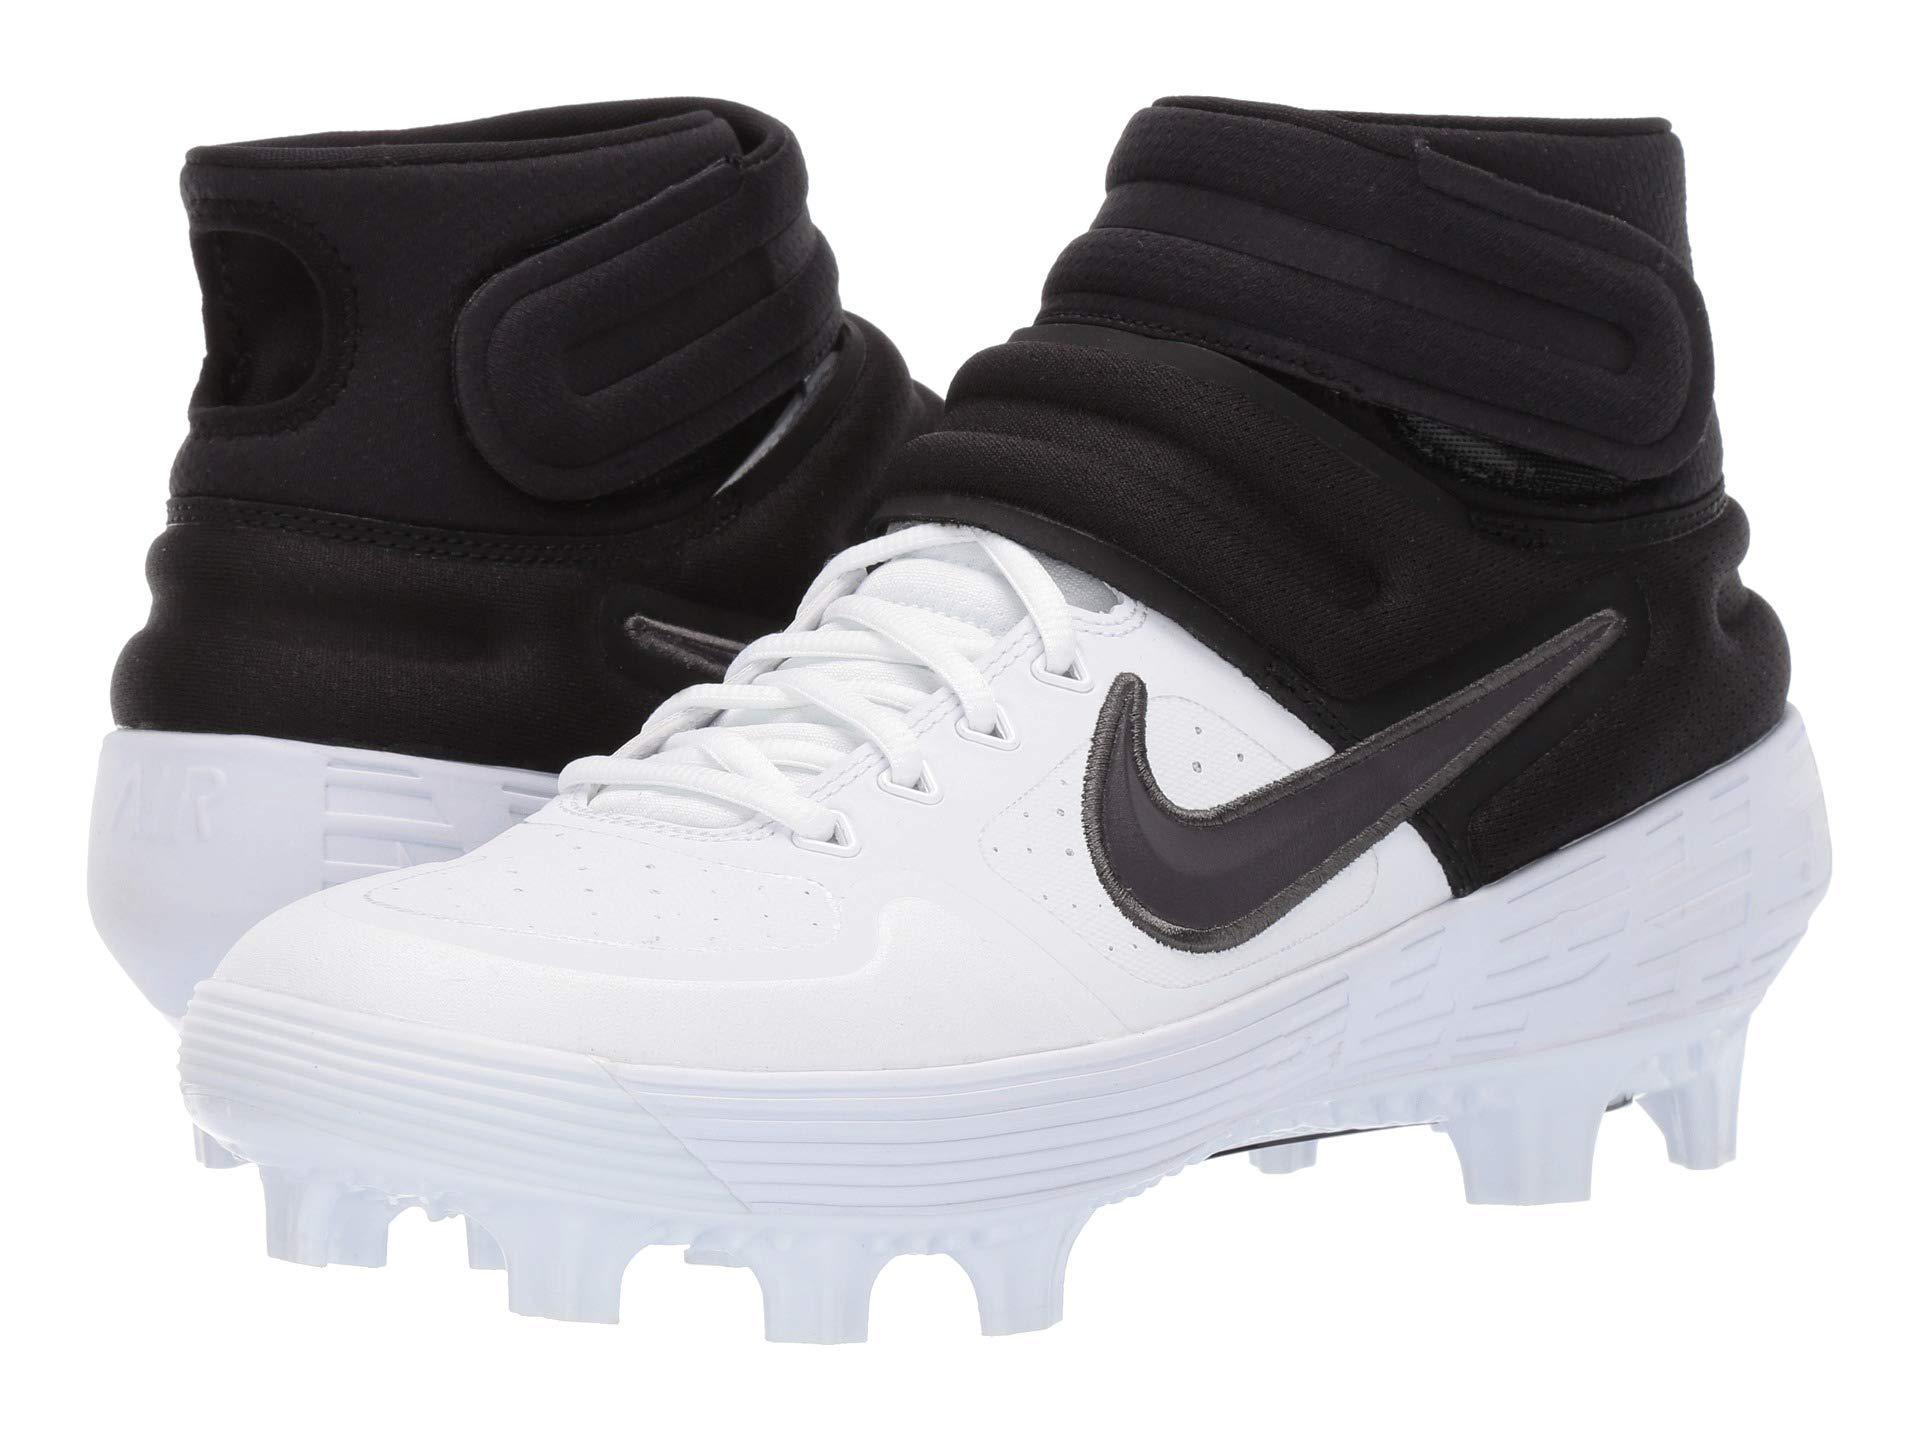 765df5fb194f Nike Alpha Huarache Elite 2 Mid Mcs (black/white) Men's Cleated ...